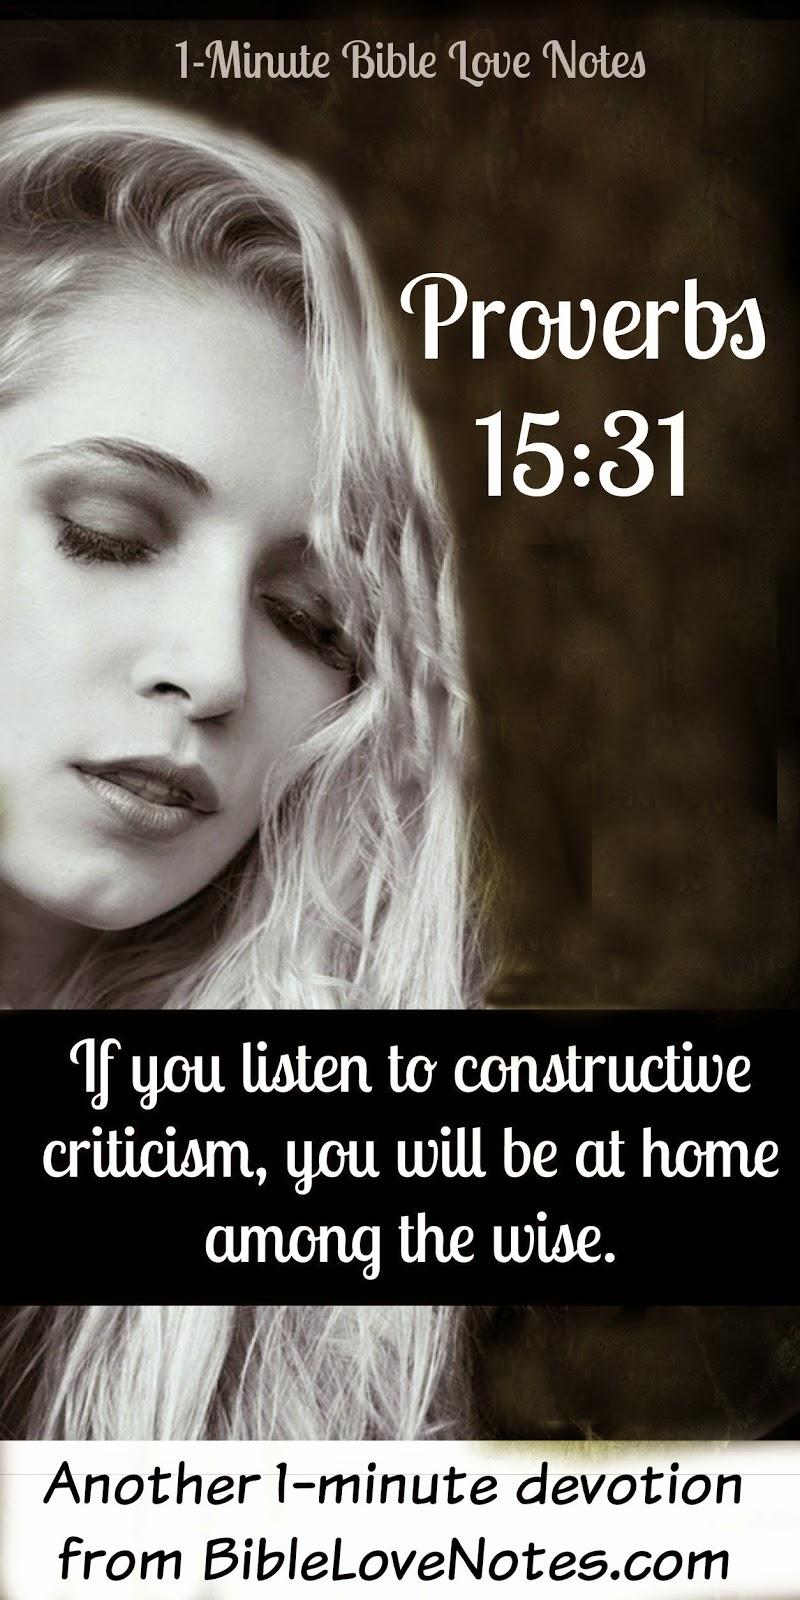 Proverbs 15:31, constructive criticism, flattery